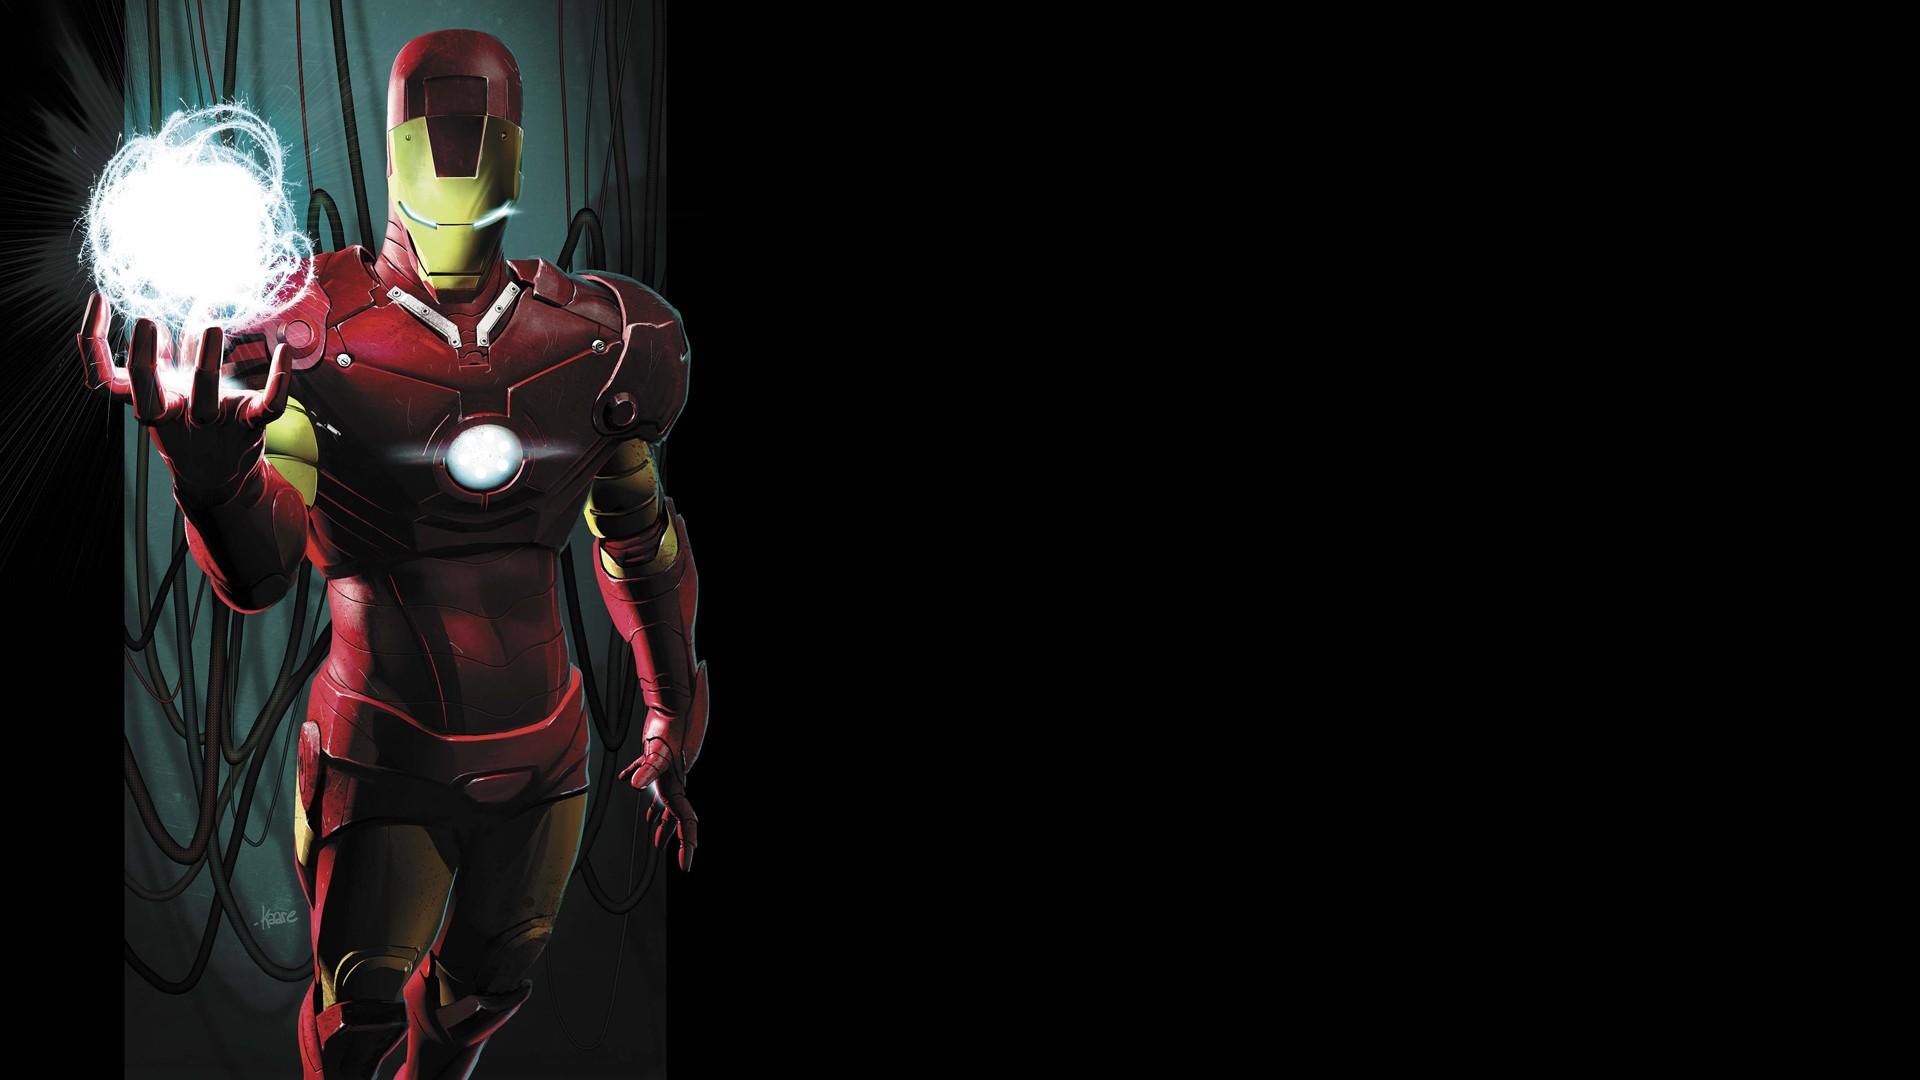 Iron Man 3 Wallpaper 1920x1080 - WallpaperSafari